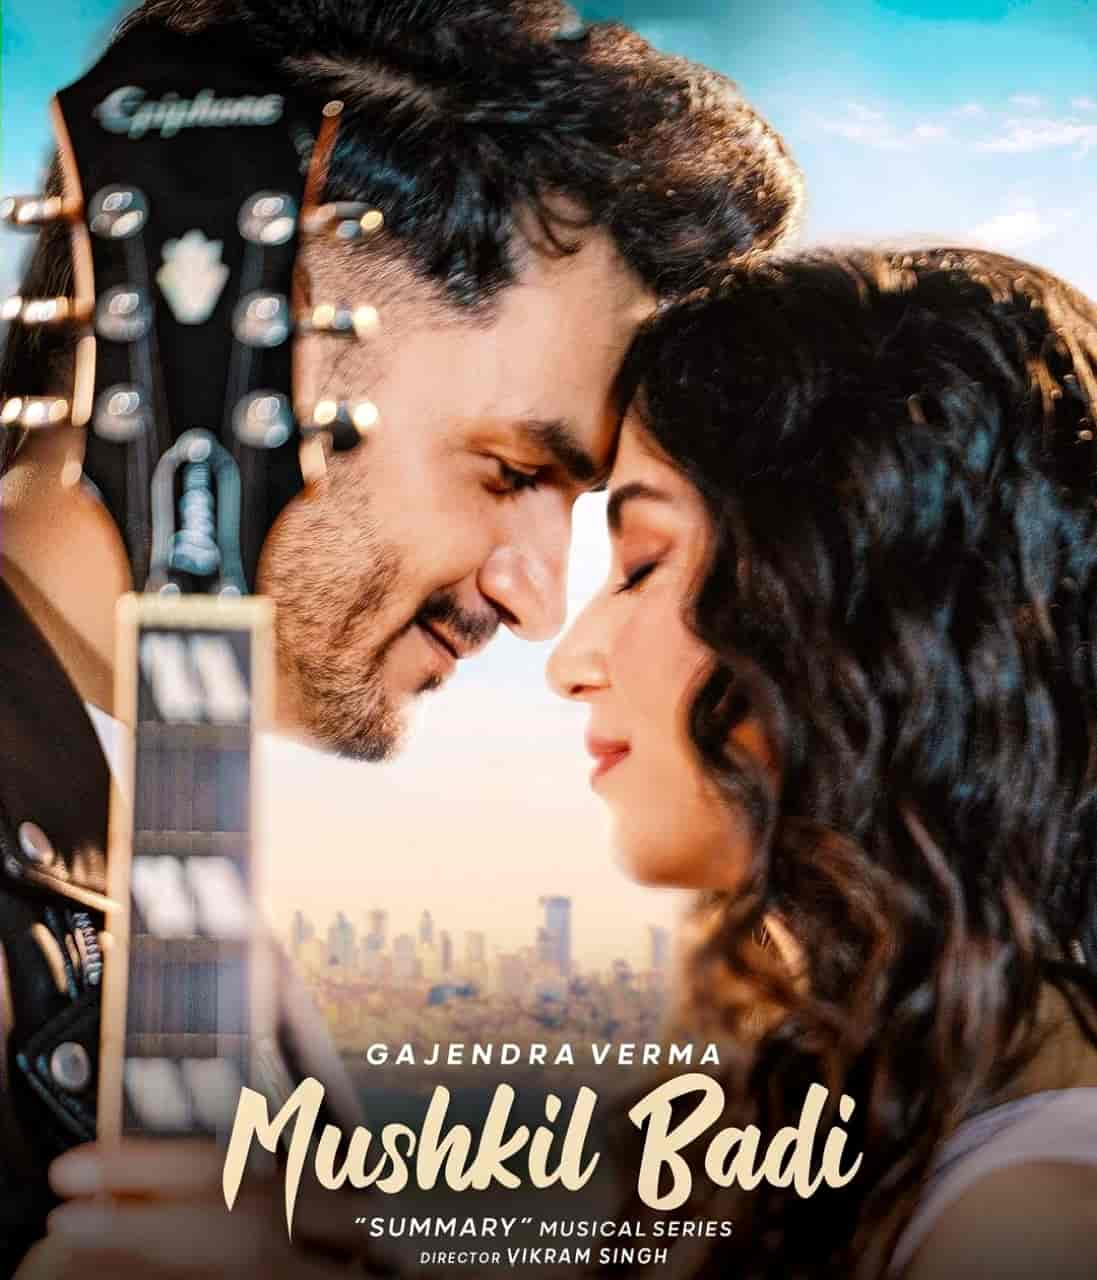 Mushkil Badi Lyrics Image Features Gajendra Verma